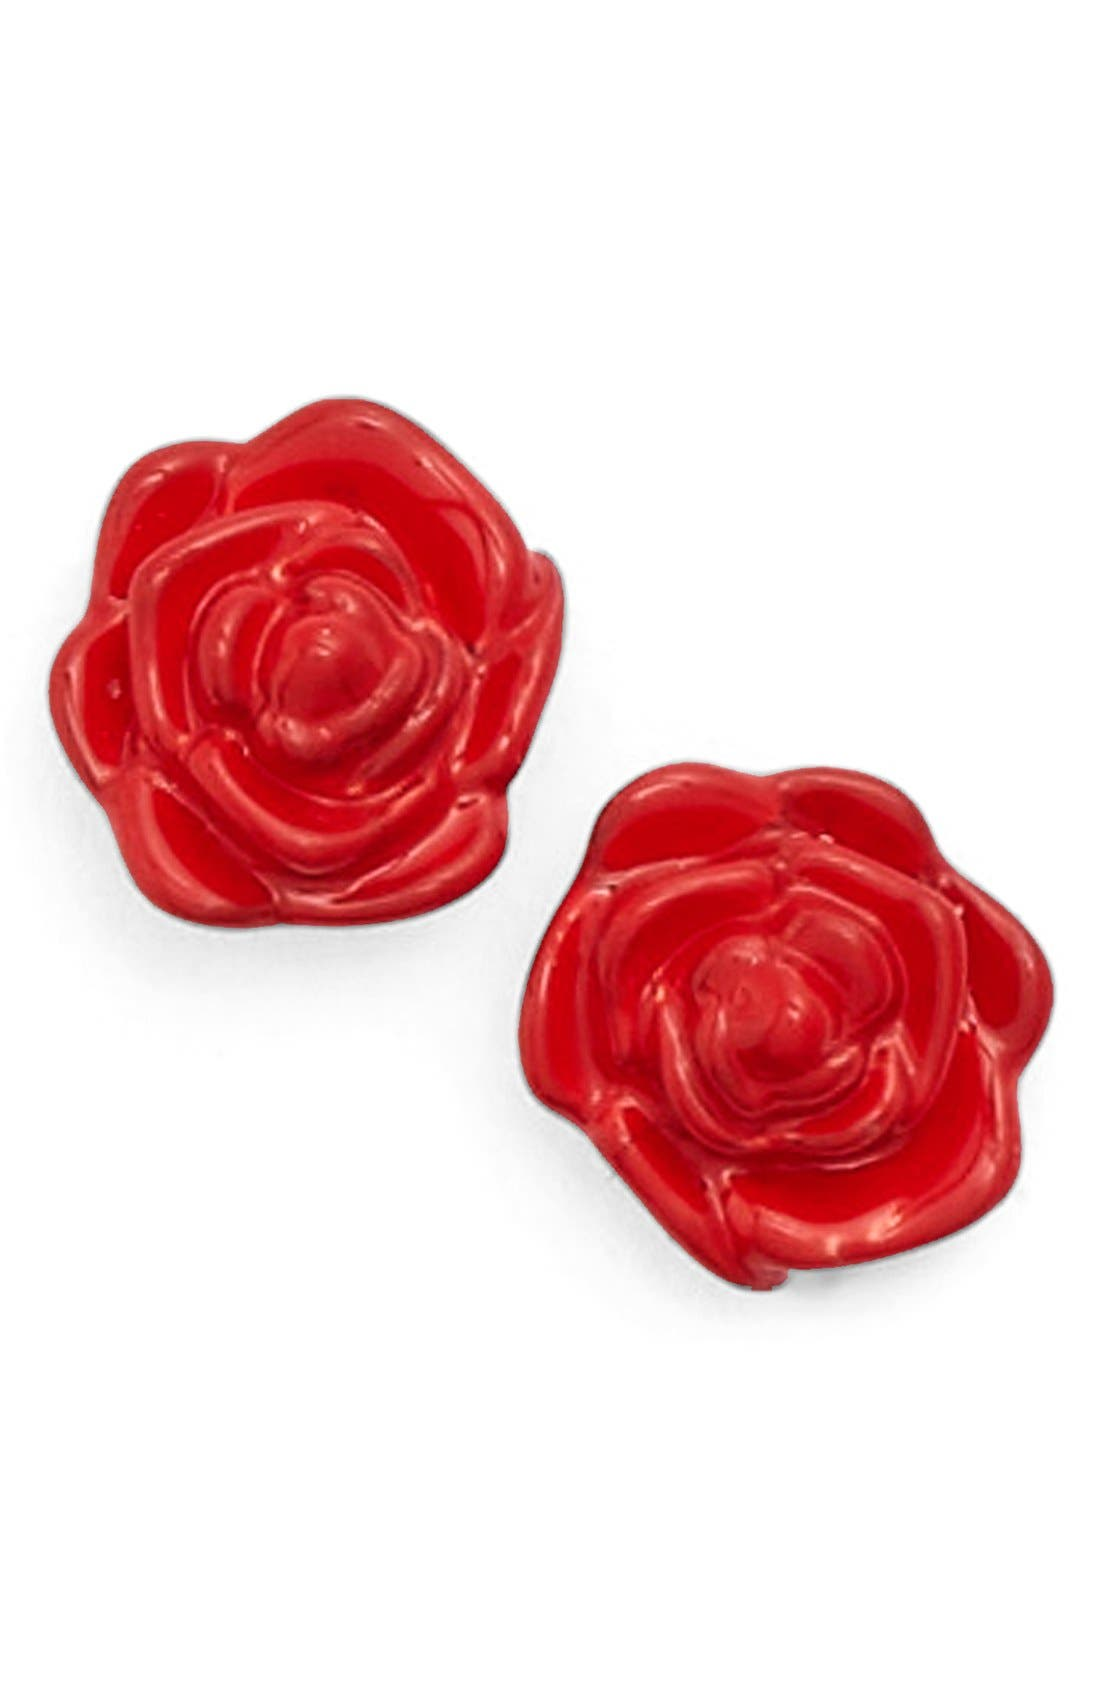 Main Image - kate spade new york 'rosy outlook' stud earrings